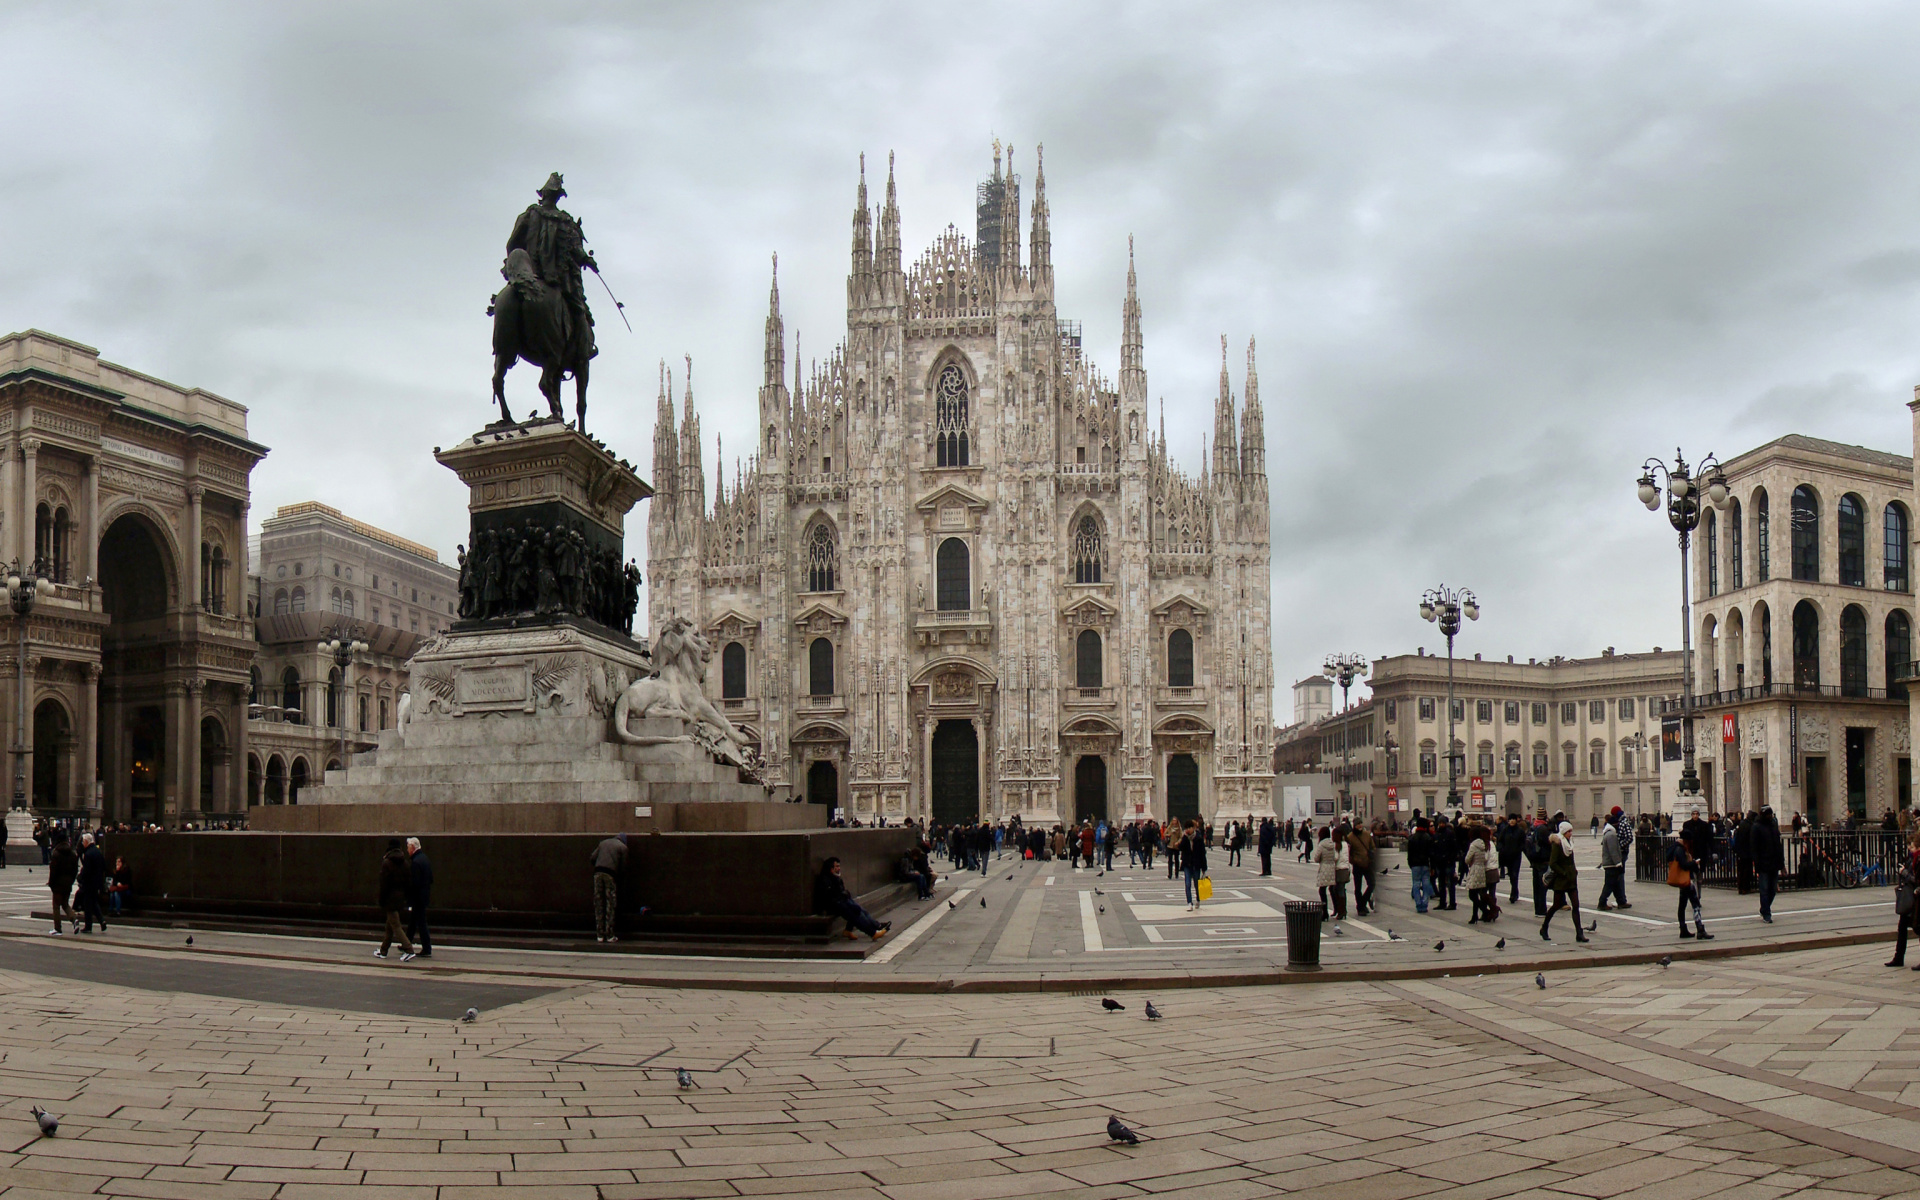 Milan cathedral duomo di milano sfondi gratuiti per for Sfondi milan hd